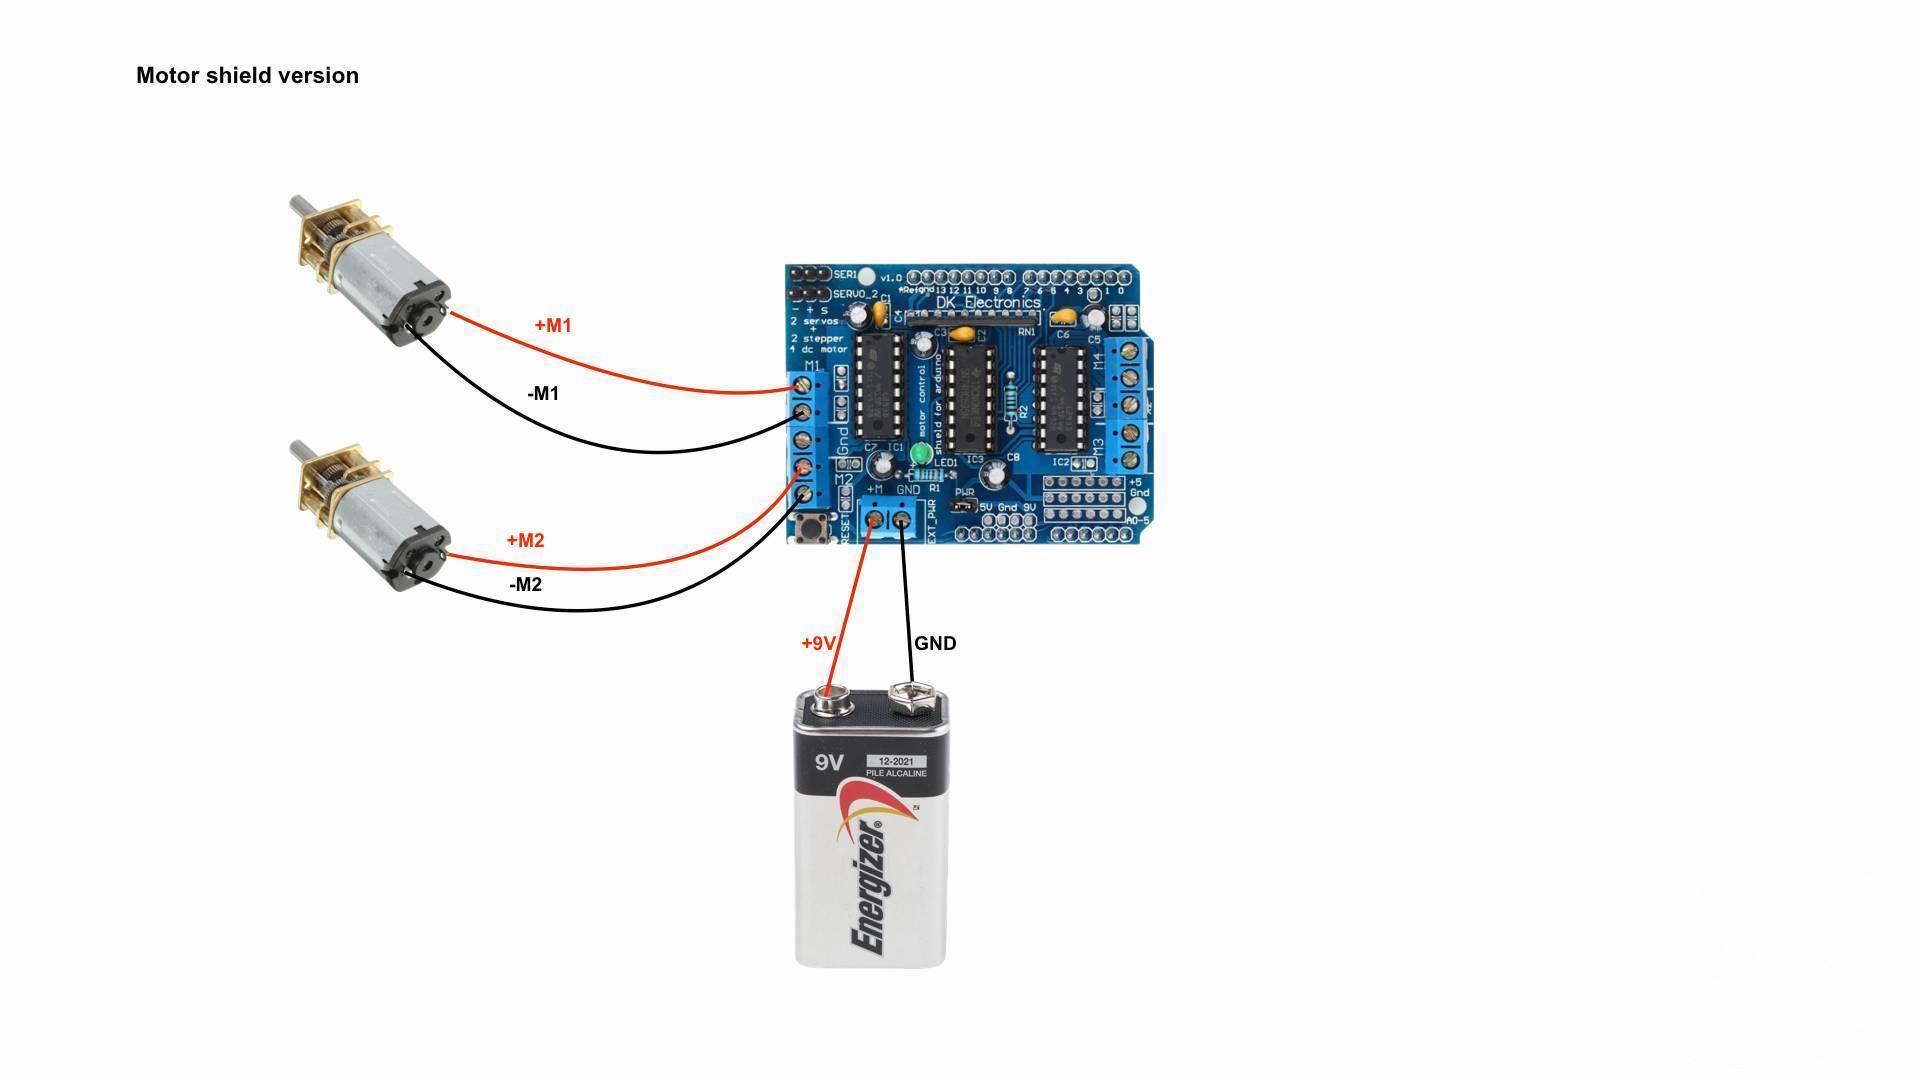 maxresdefault.jpg Download free STL file SMARS modular Robot • 3D printable design, Tuitxy